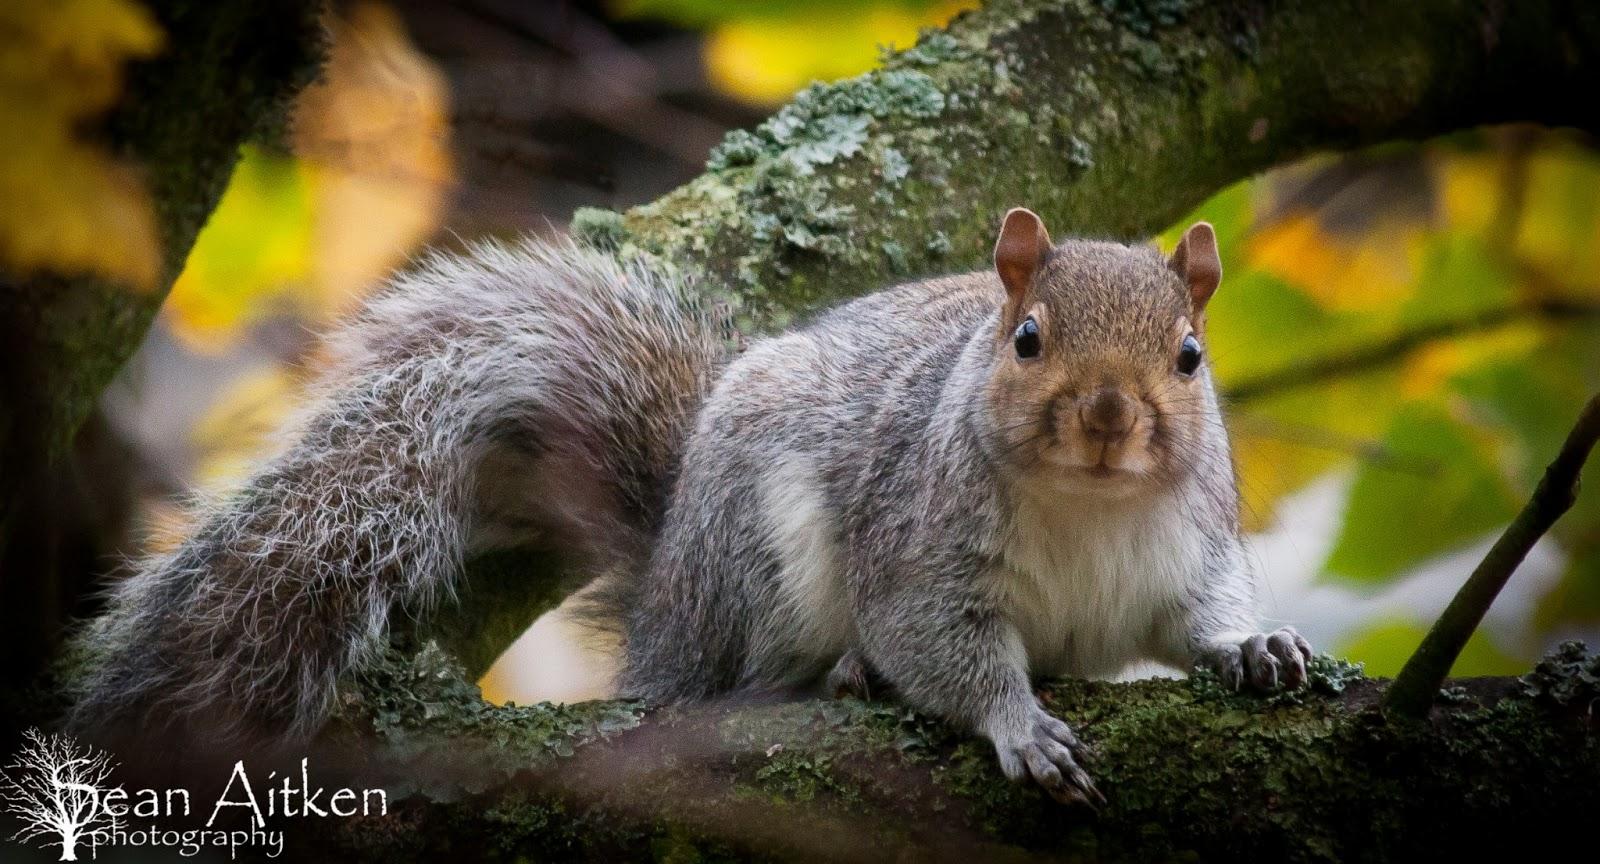 Beautiful Wallpapers Squirrels Wallpaper-9786